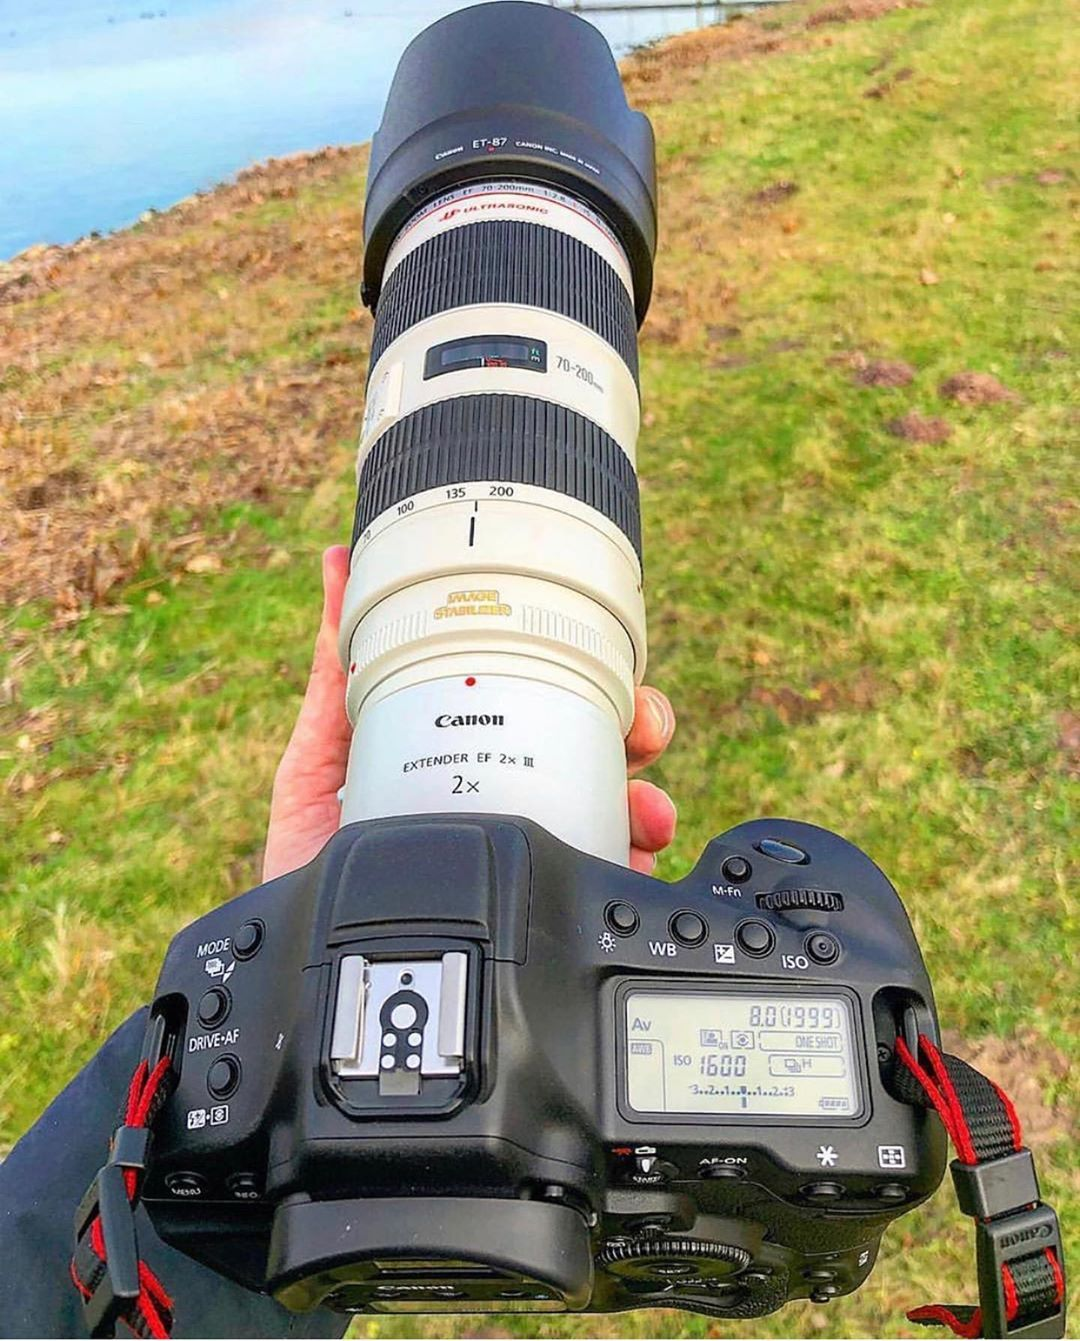 Canon 1dx Mkii With A Canon 70 200mm F 2 8 2x Extender Fotograf Makinesi Fotograf Makineleri Objektif